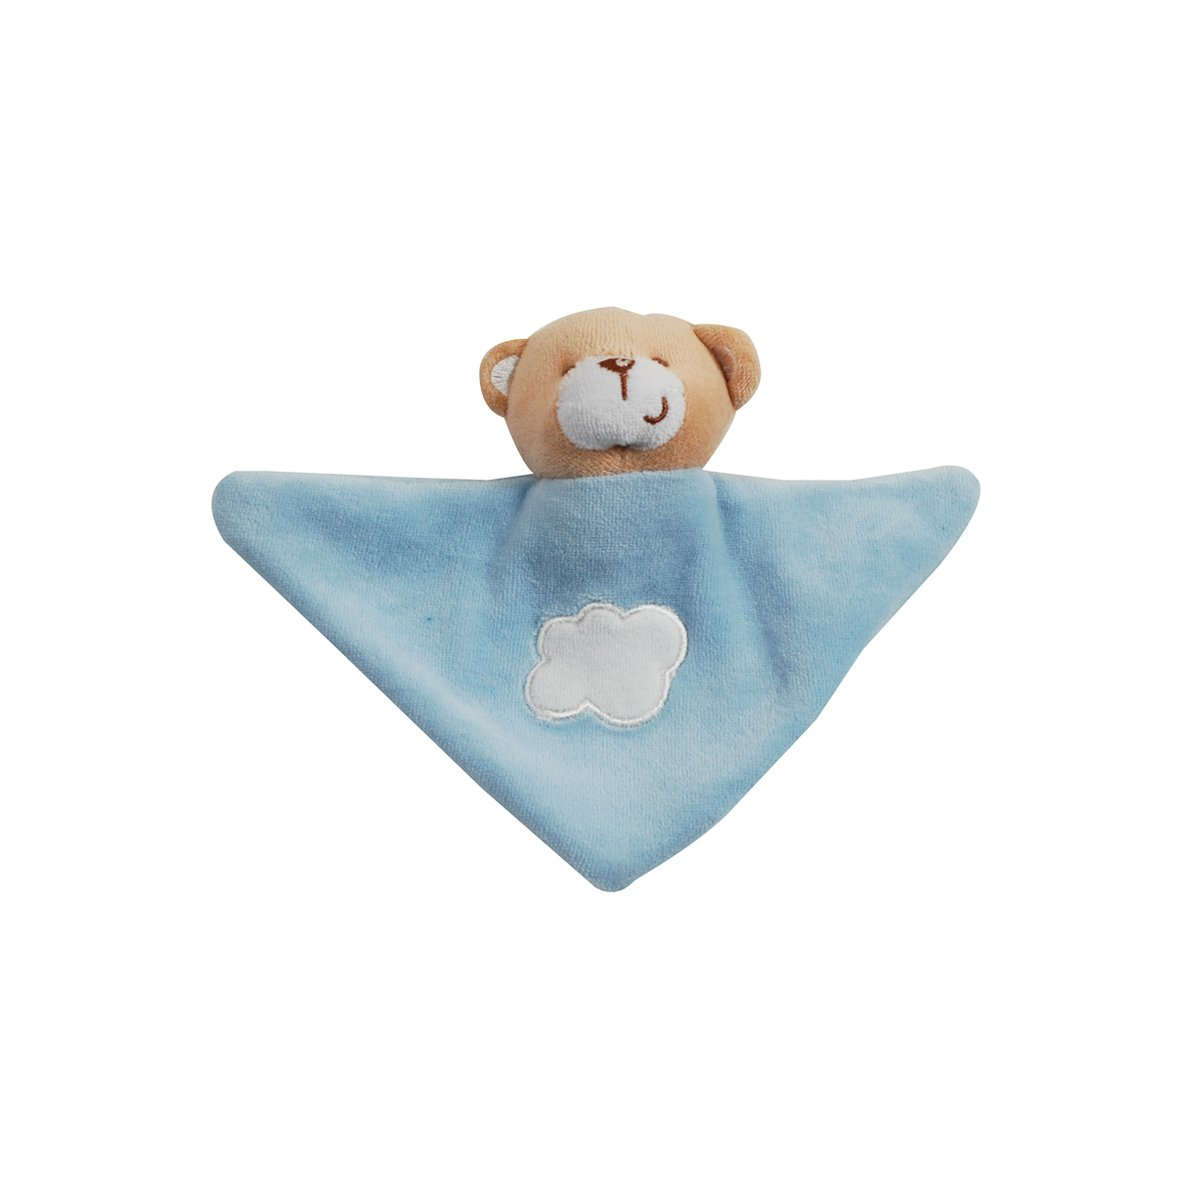 Doudou Triángulo del oso del bebé King Bear - Azul